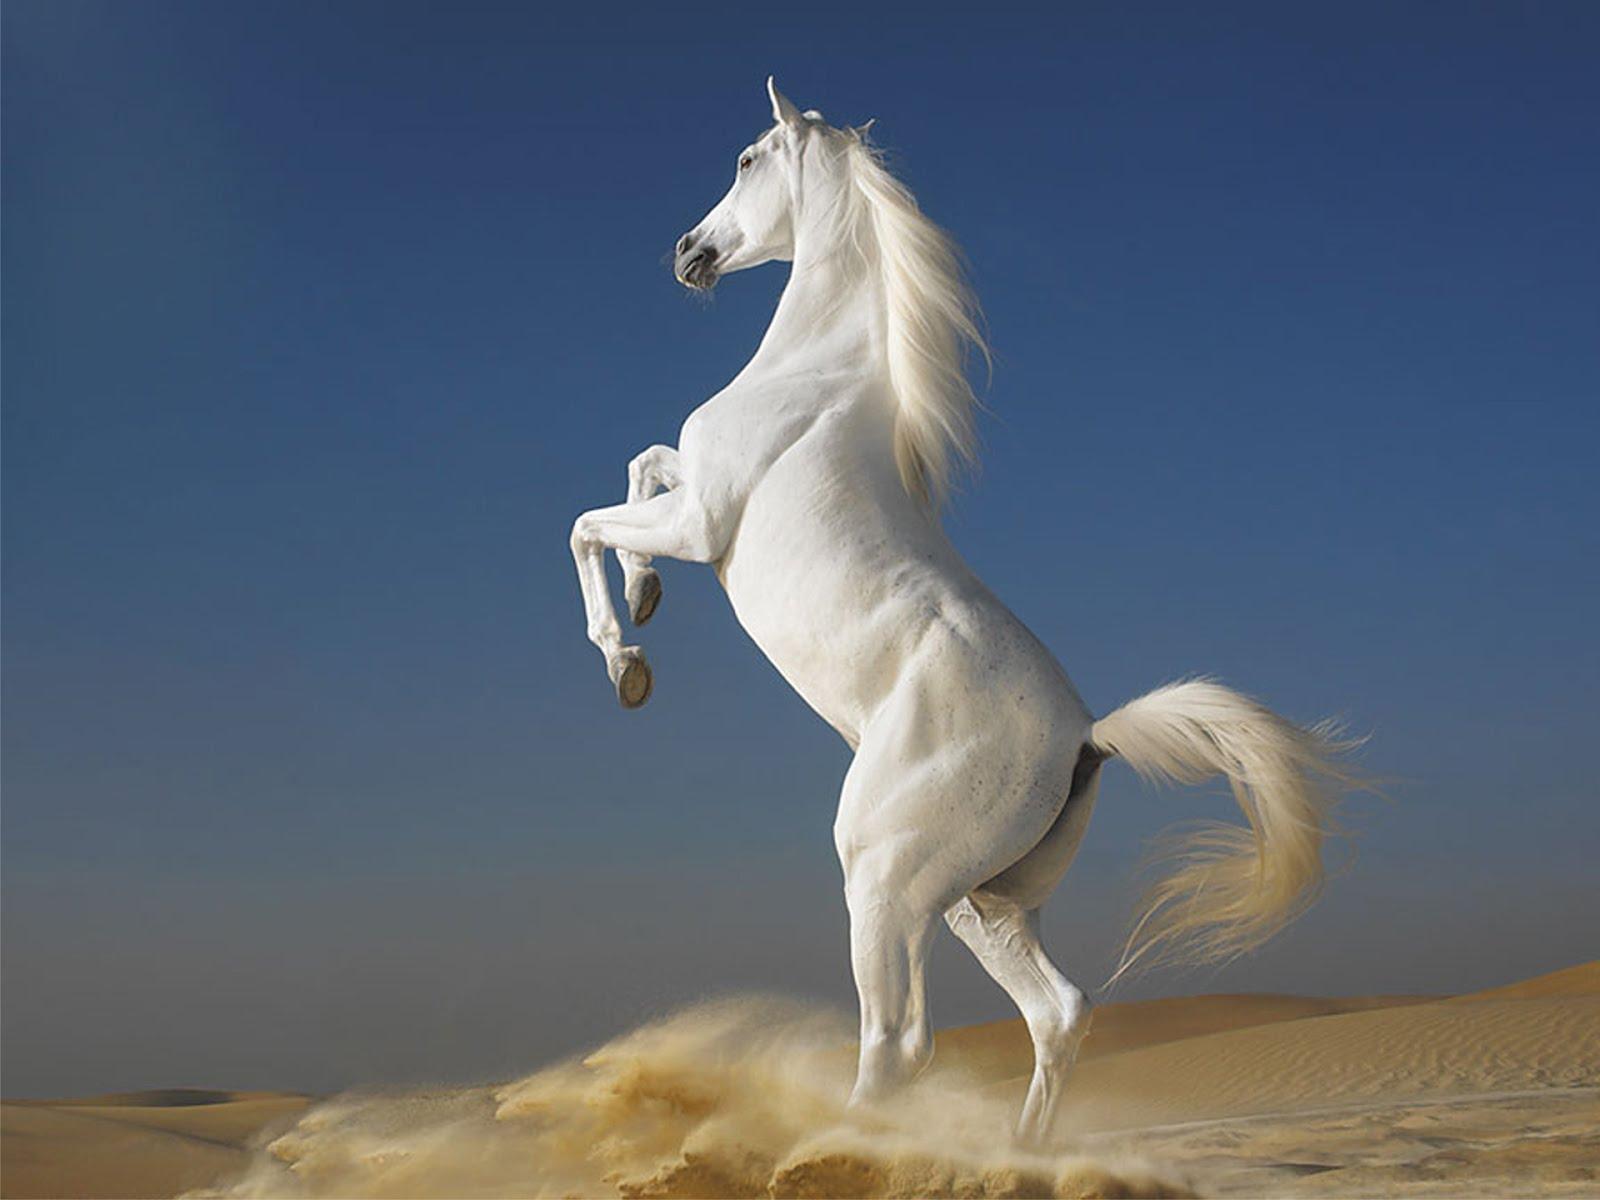 http://1.bp.blogspot.com/-8OEk5xyyeE0/UBFNiIi5LcI/AAAAAAAAI8U/lDvayg4C-uY/s1600/White_Horse_-_best_computer_backgrounds.jpg#white%20horse%20wild%201600x1200